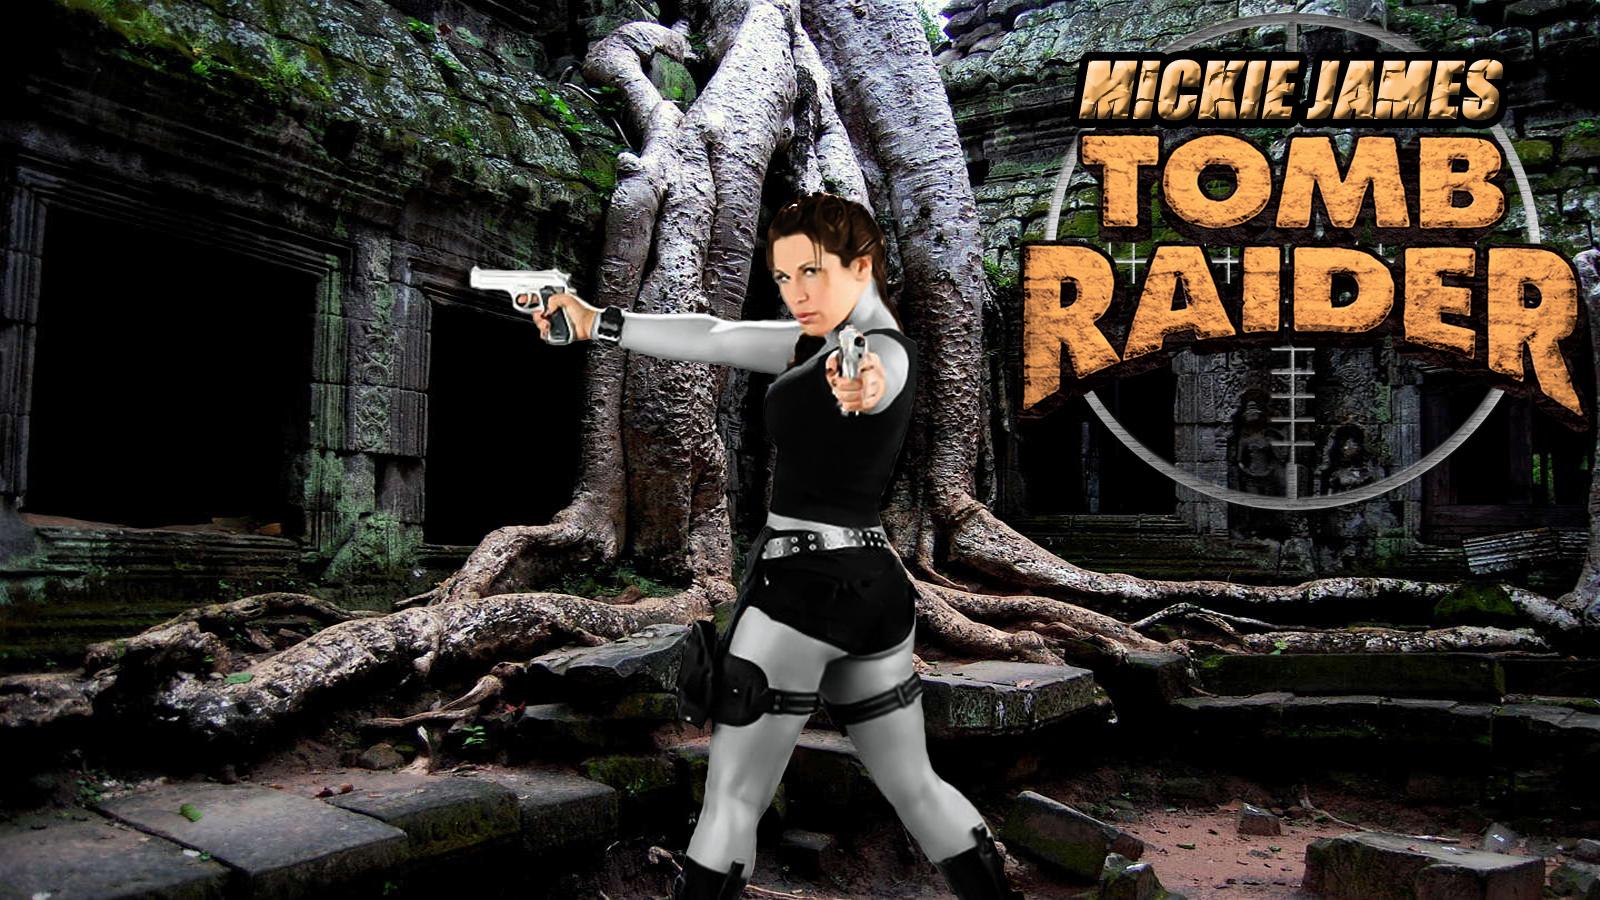 Mickie James Tomb Raider wp 2